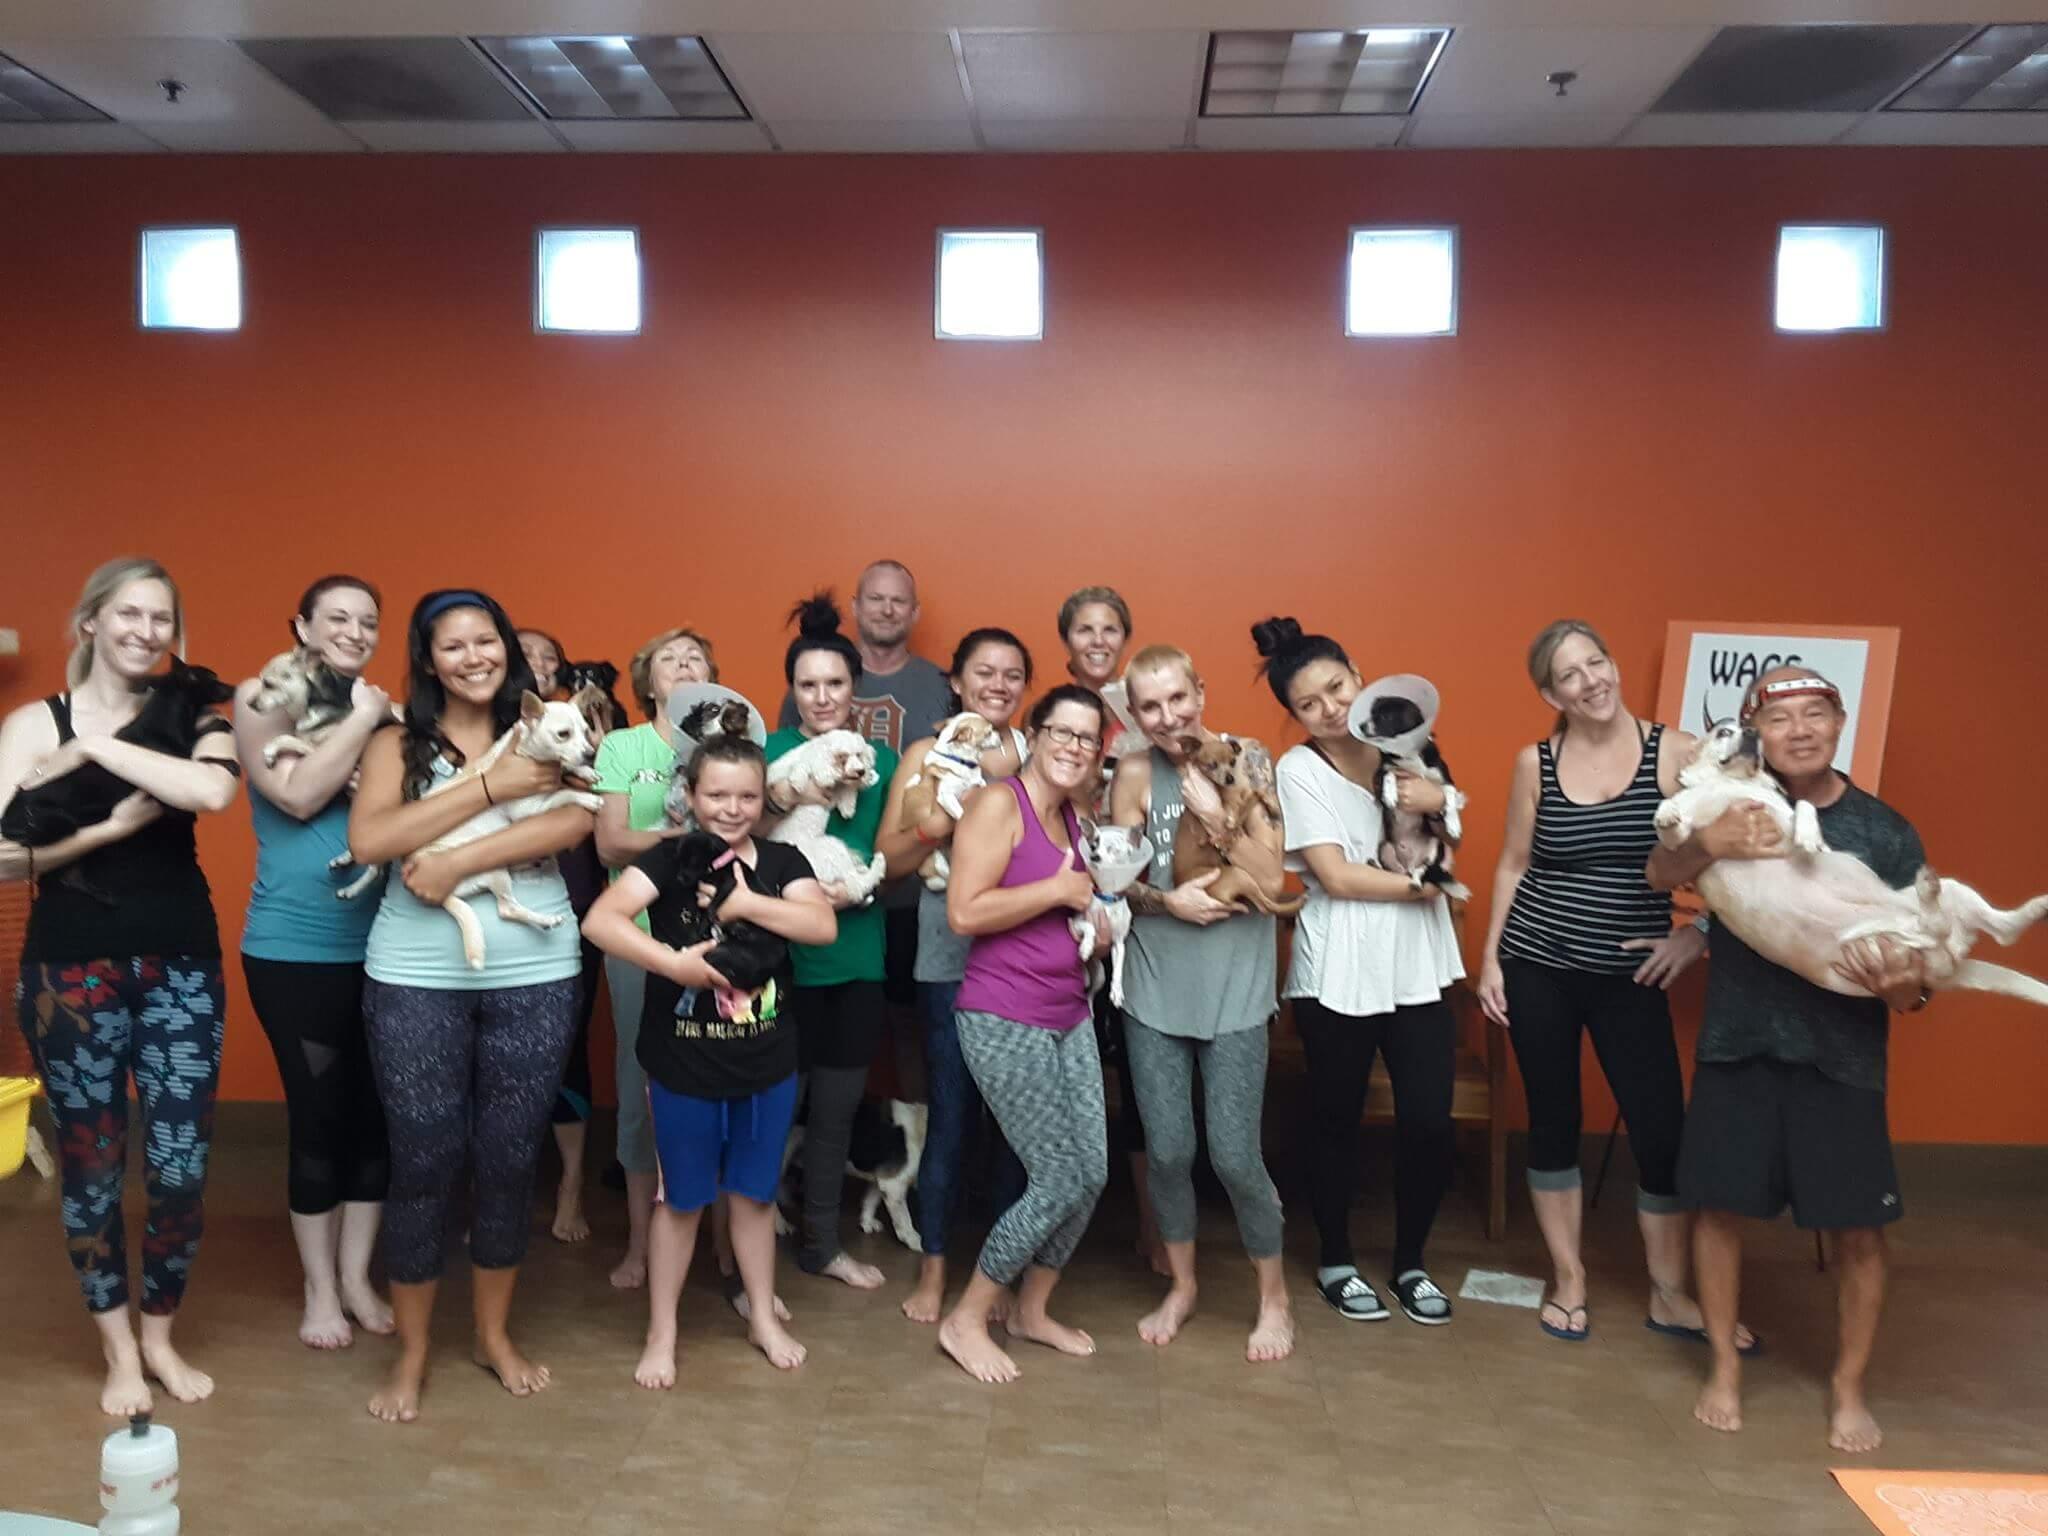 WAGS new dog yoga class